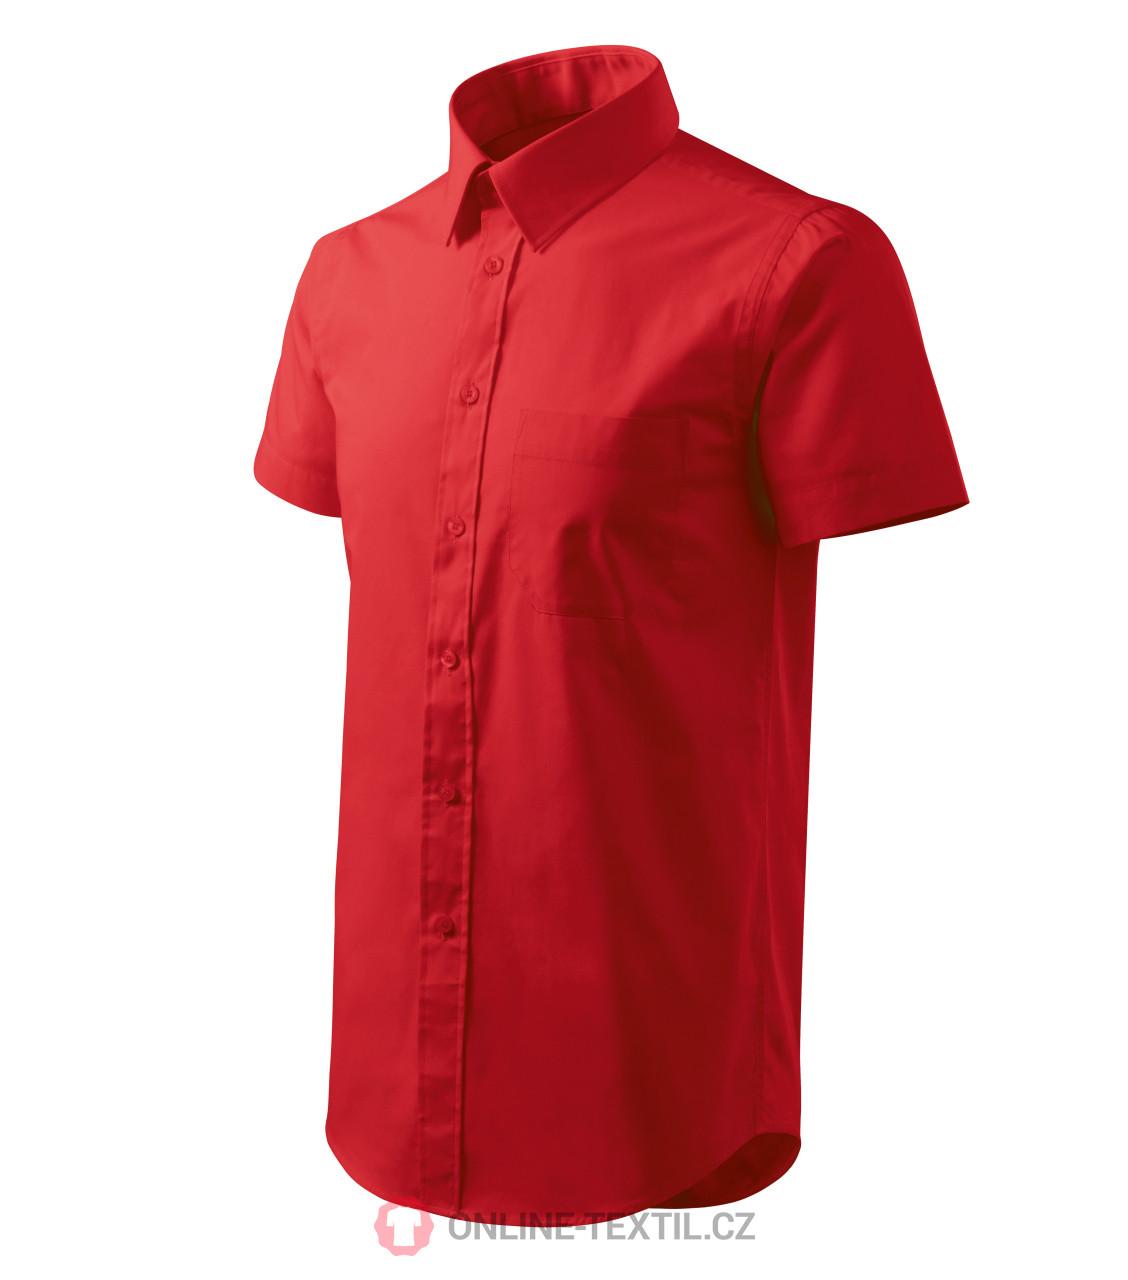 832b170be63b ADLER CZECH Košeľa pánska Shirt short sleeve 2X7 - červená z ...